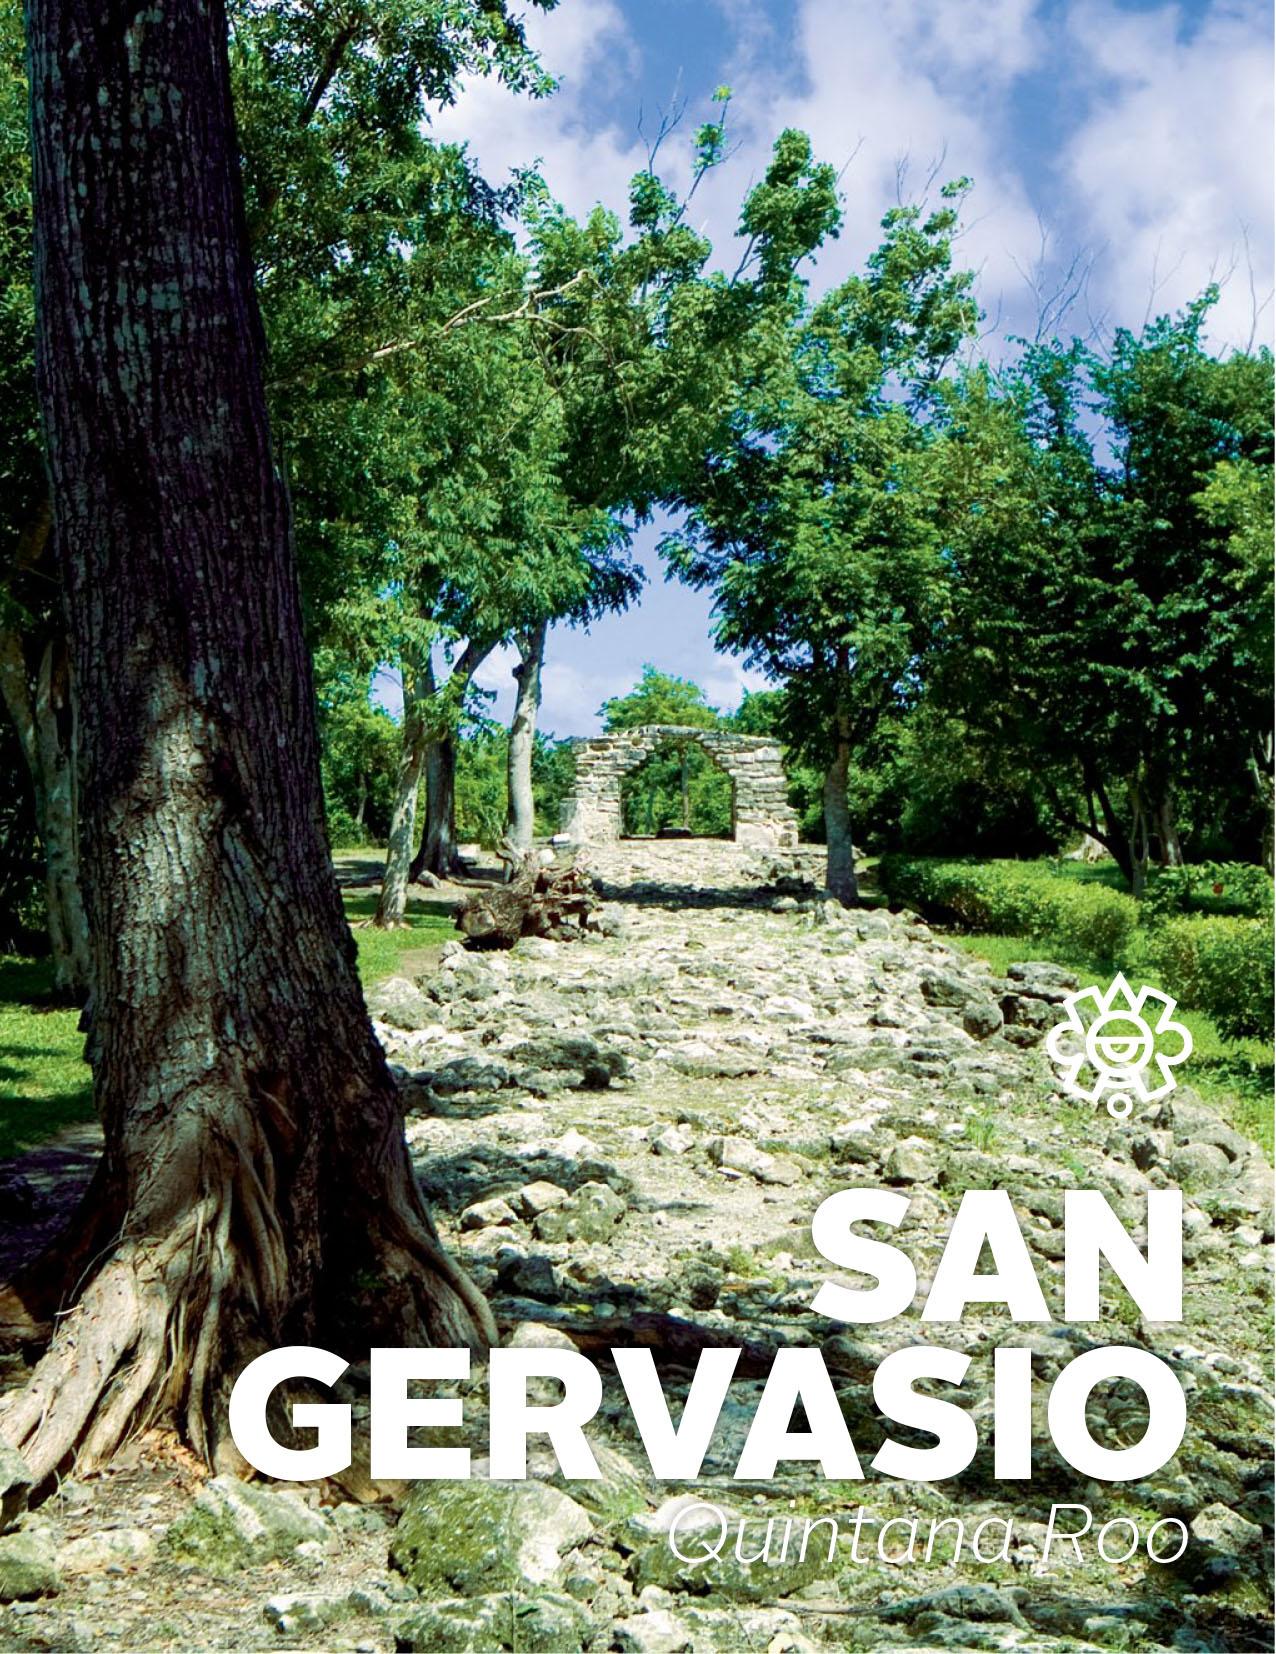 San Gervasio